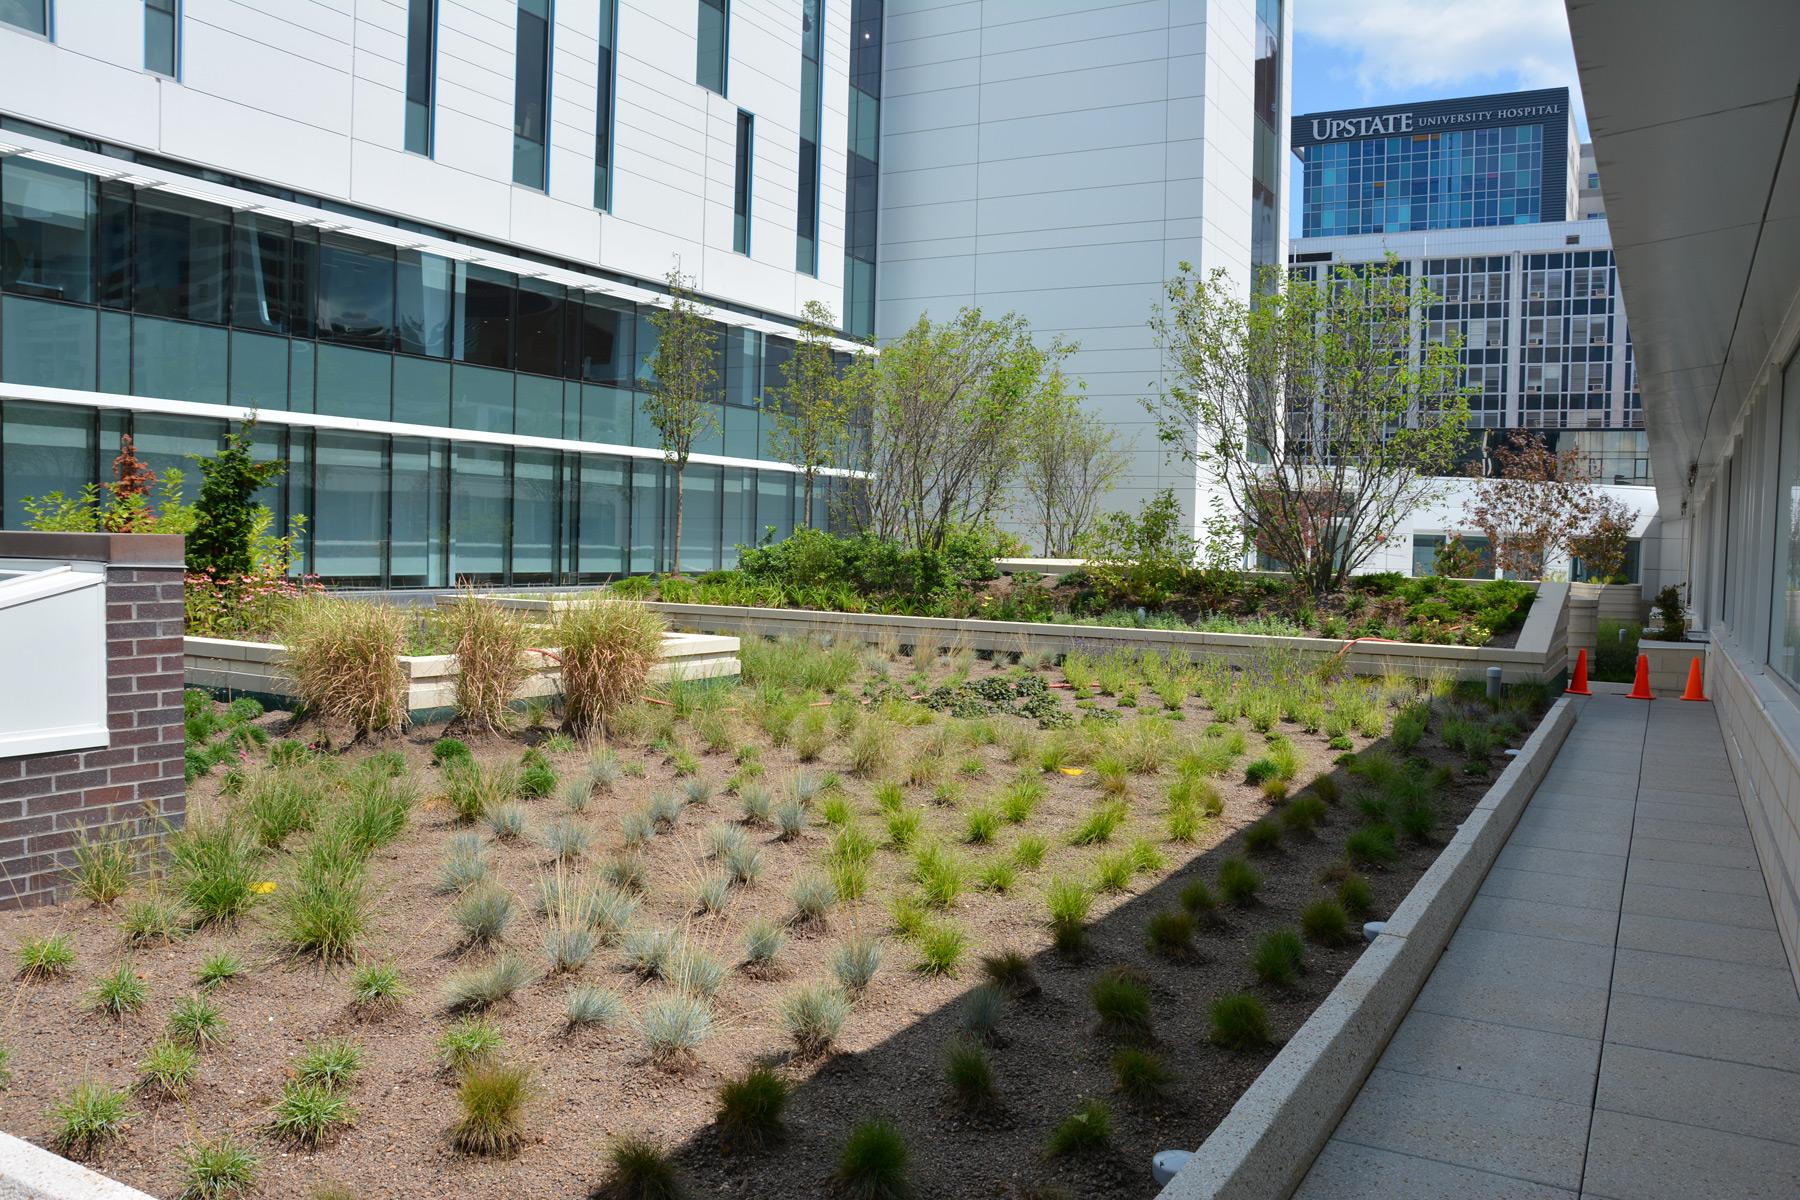 Cancer Center Roof Garden